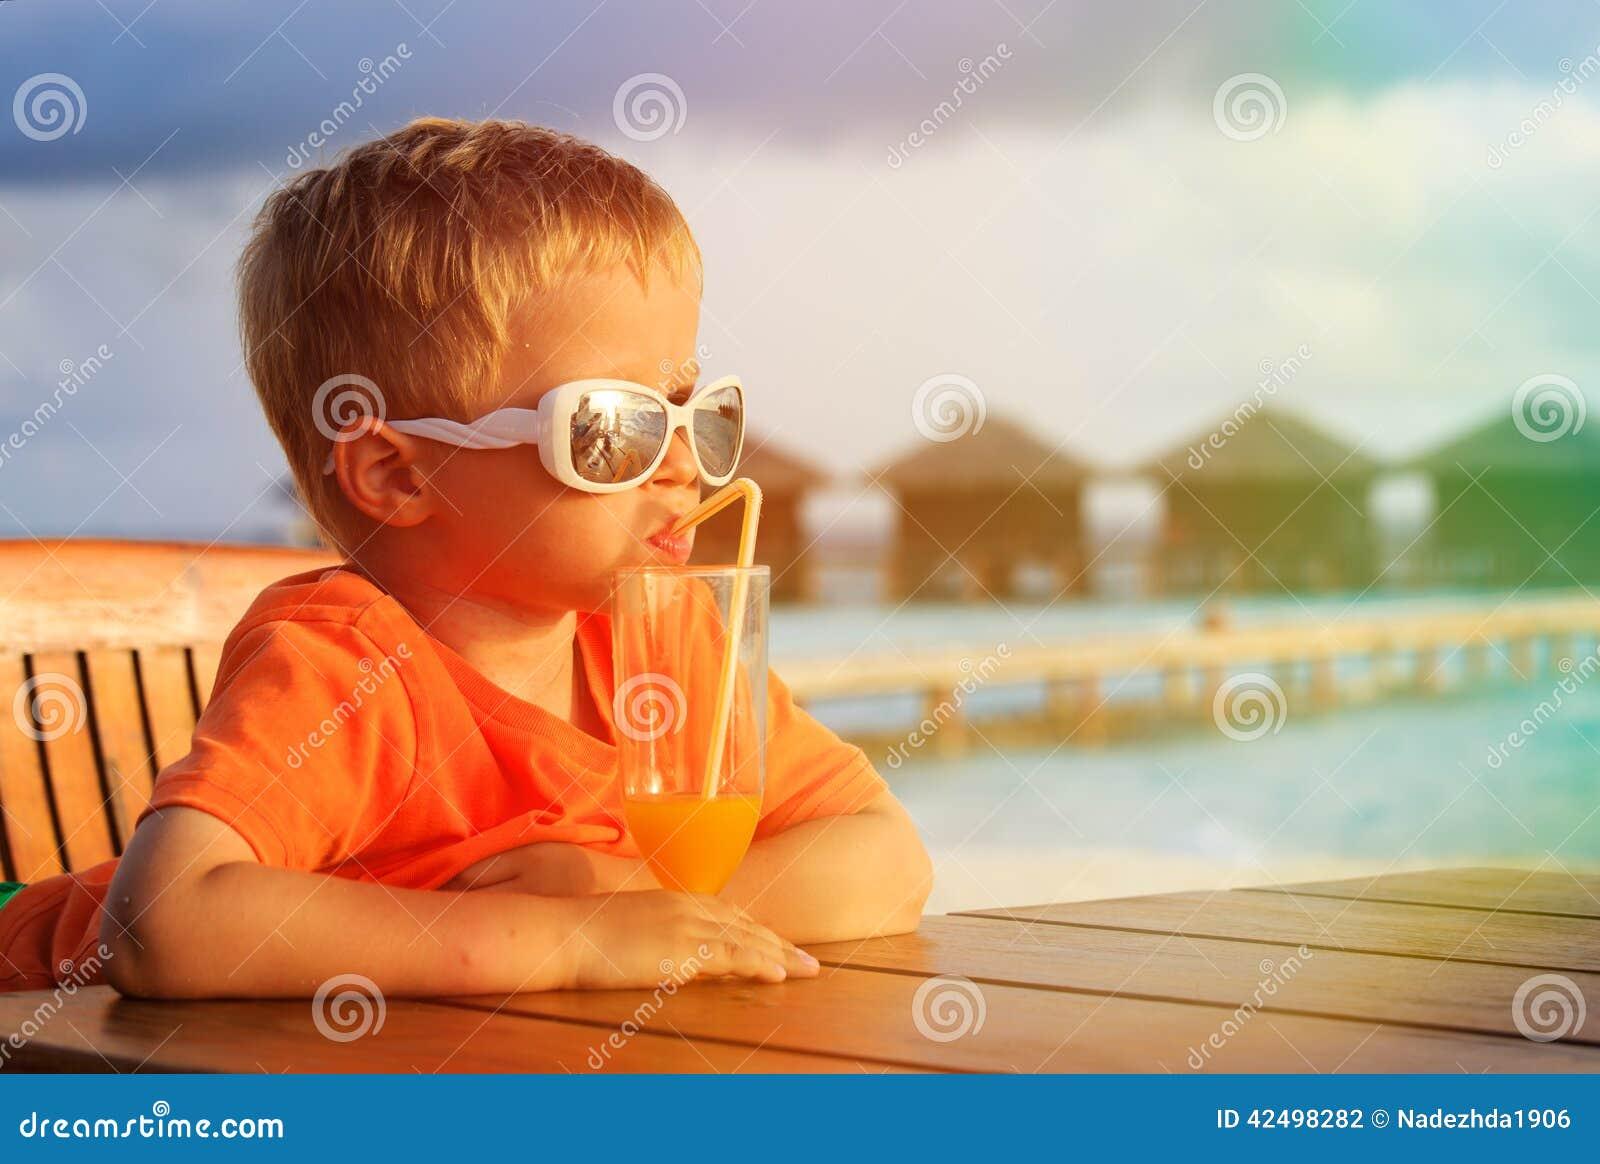 Cocktail bebendo do rapaz pequeno na praia tropical